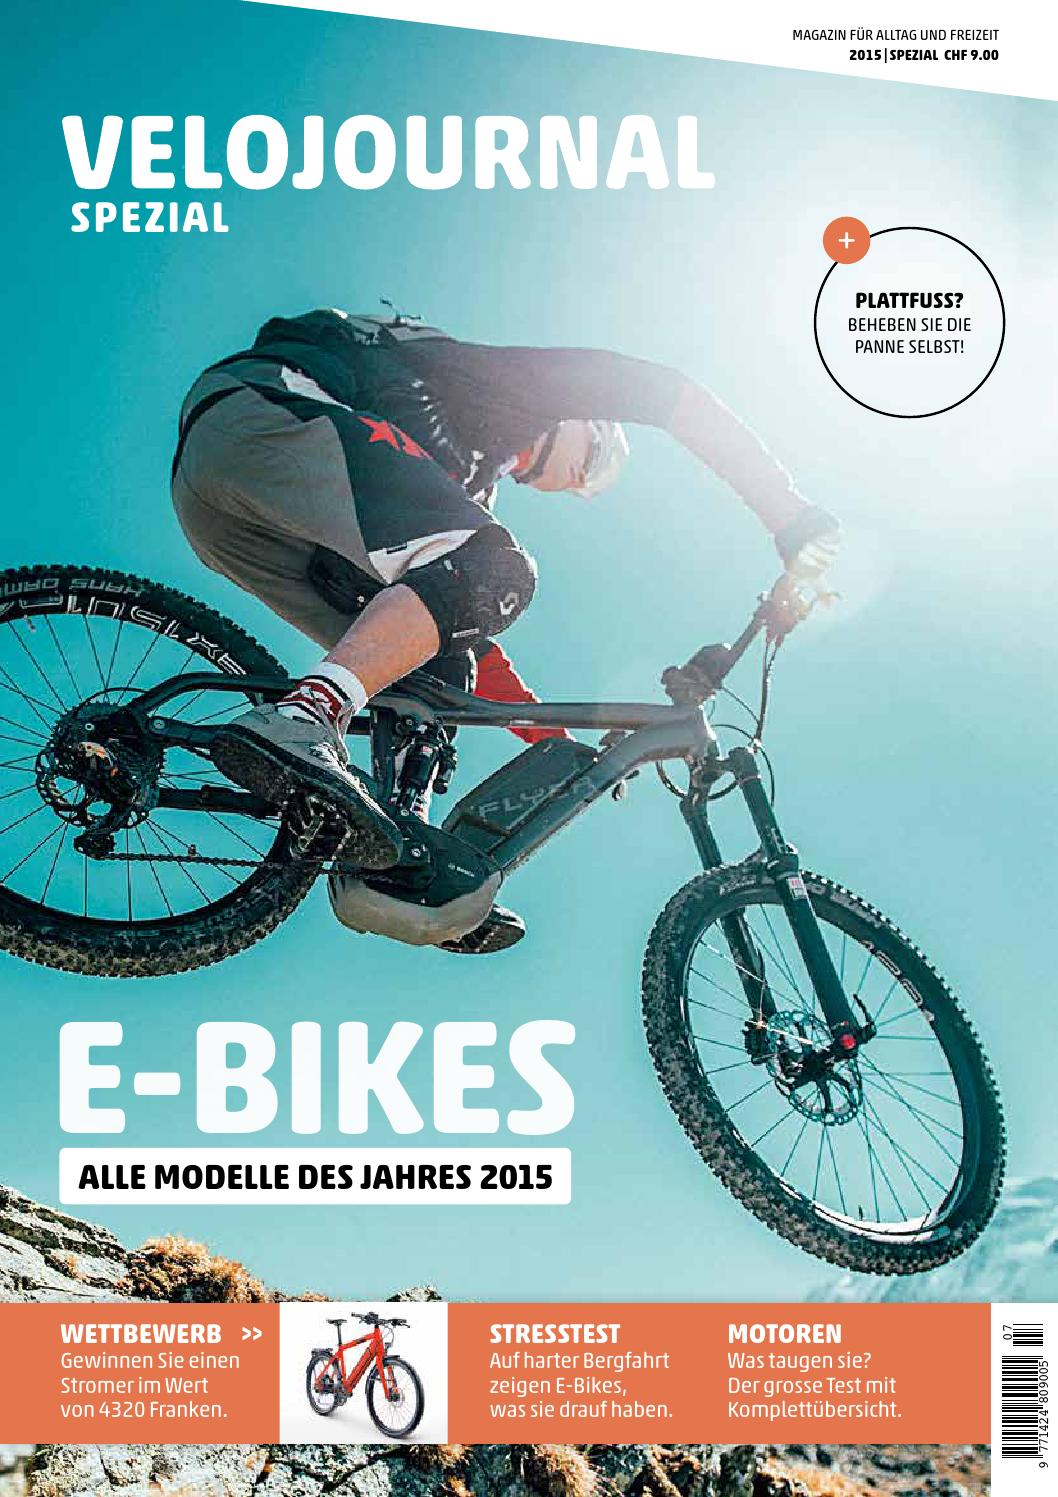 velojournal e bike spezial 2015 by fabian baumann issuu. Black Bedroom Furniture Sets. Home Design Ideas